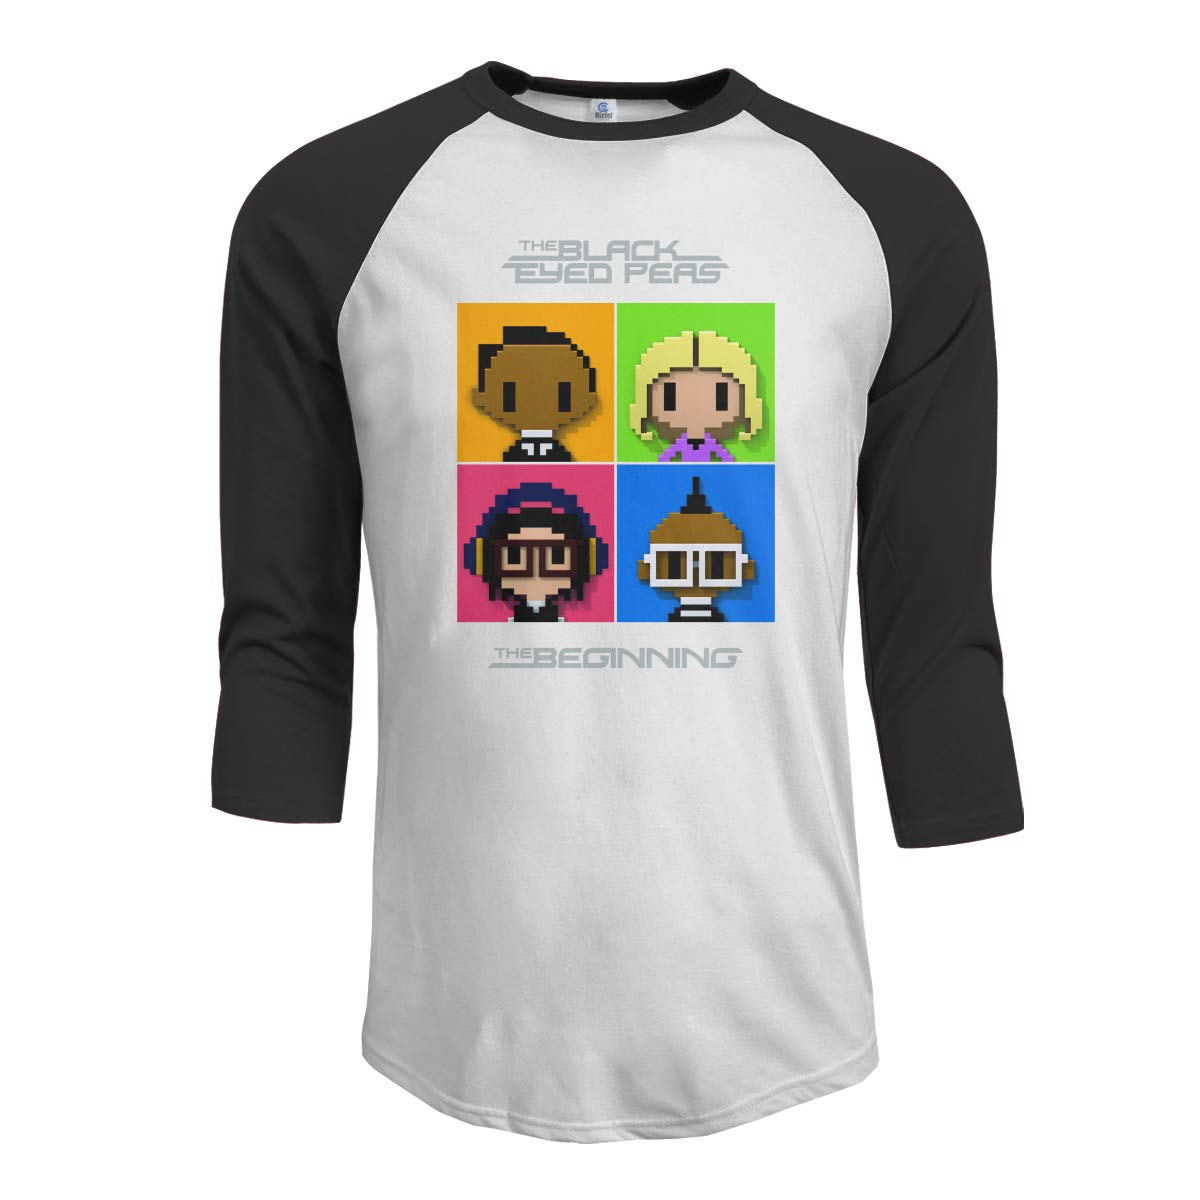 JeremiahR The Black Eyed Peas The Beginning Mens 3//4 Sleeve Raglan Baseball T Shirt Black